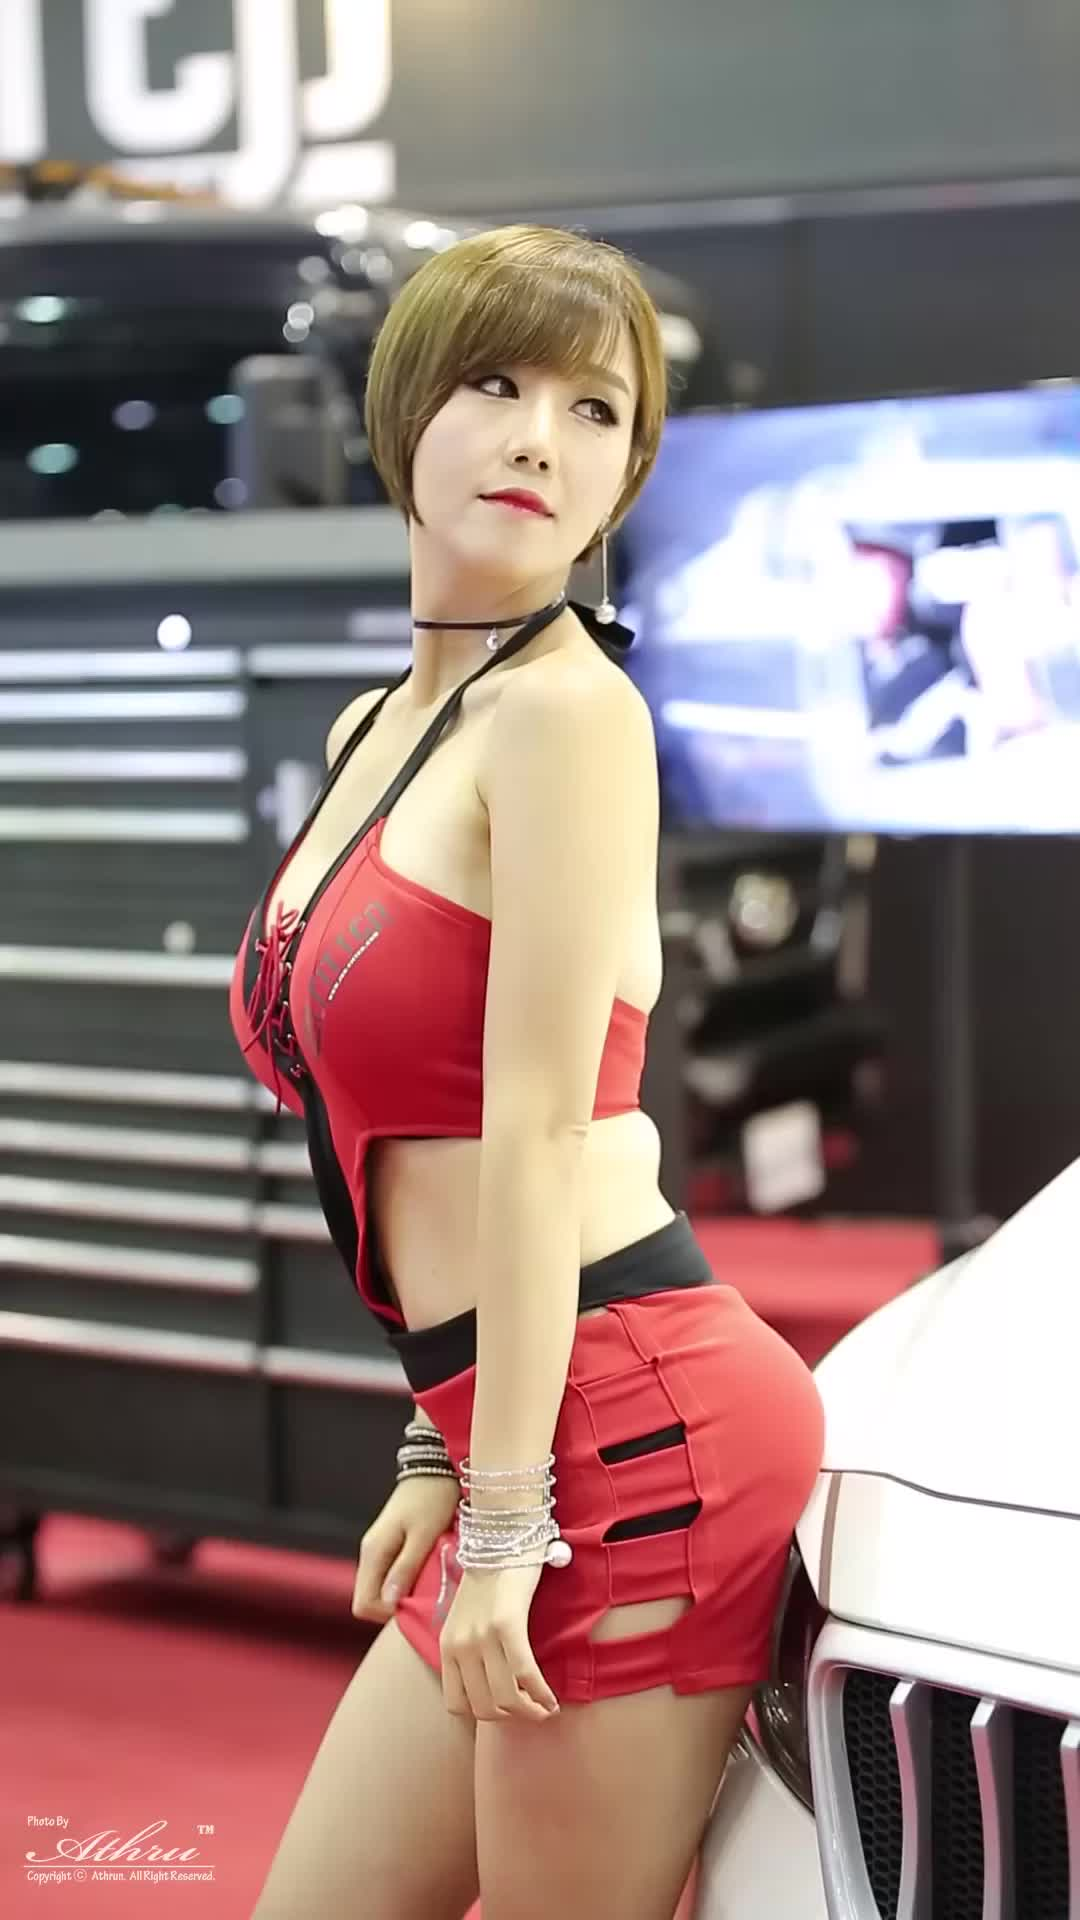 2016 Automotive Week - 한혜은 Han Hye Eun